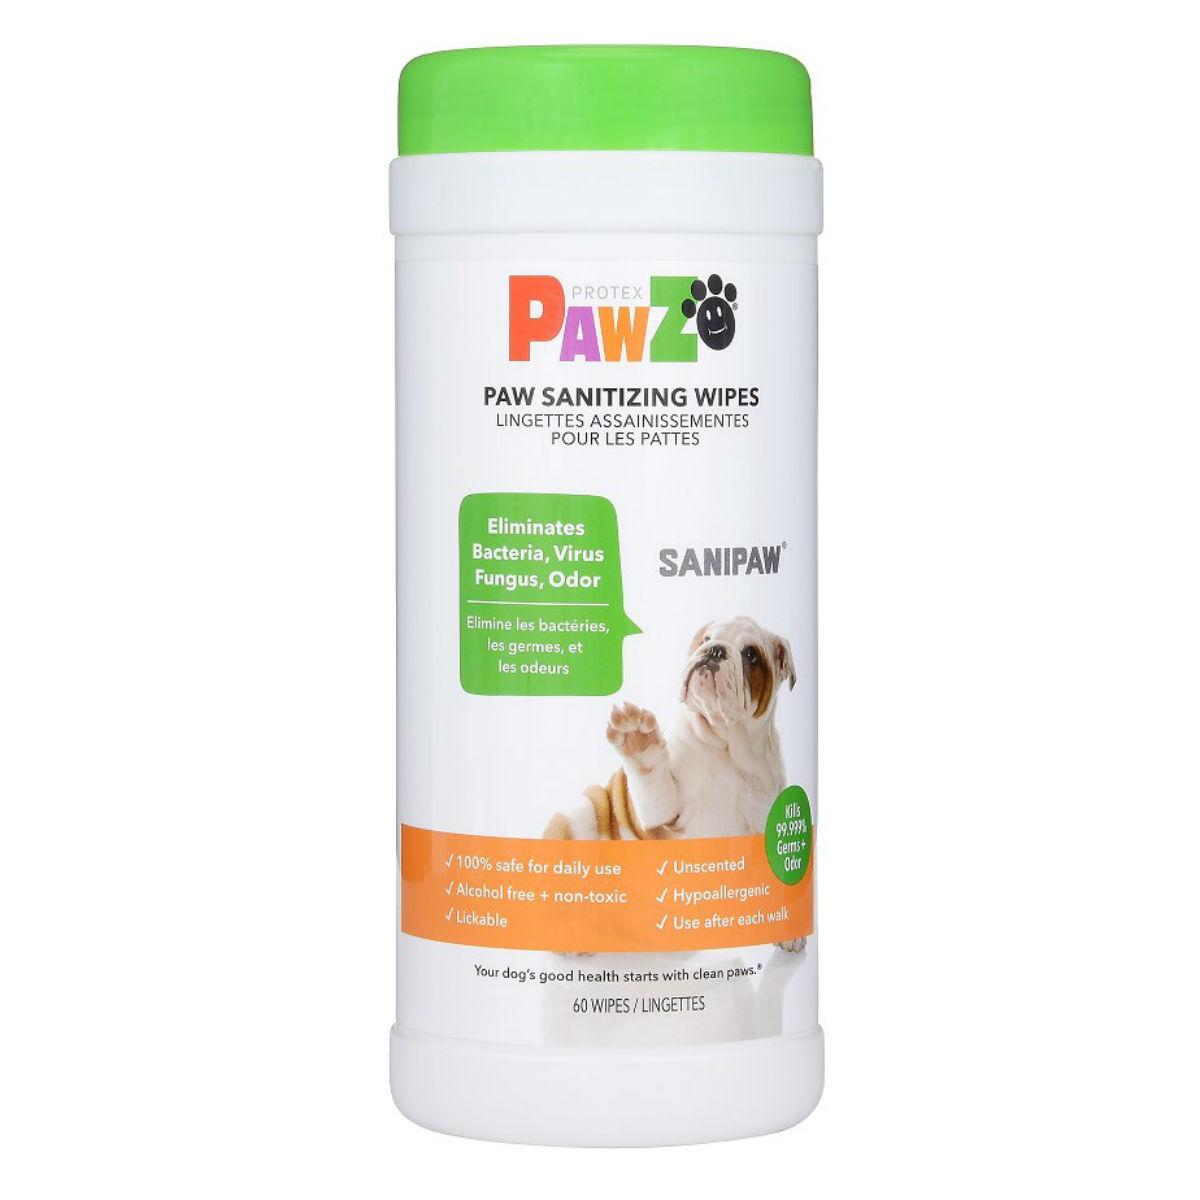 PAWZ Sanipaw Paw Sanitizing Wipes Image